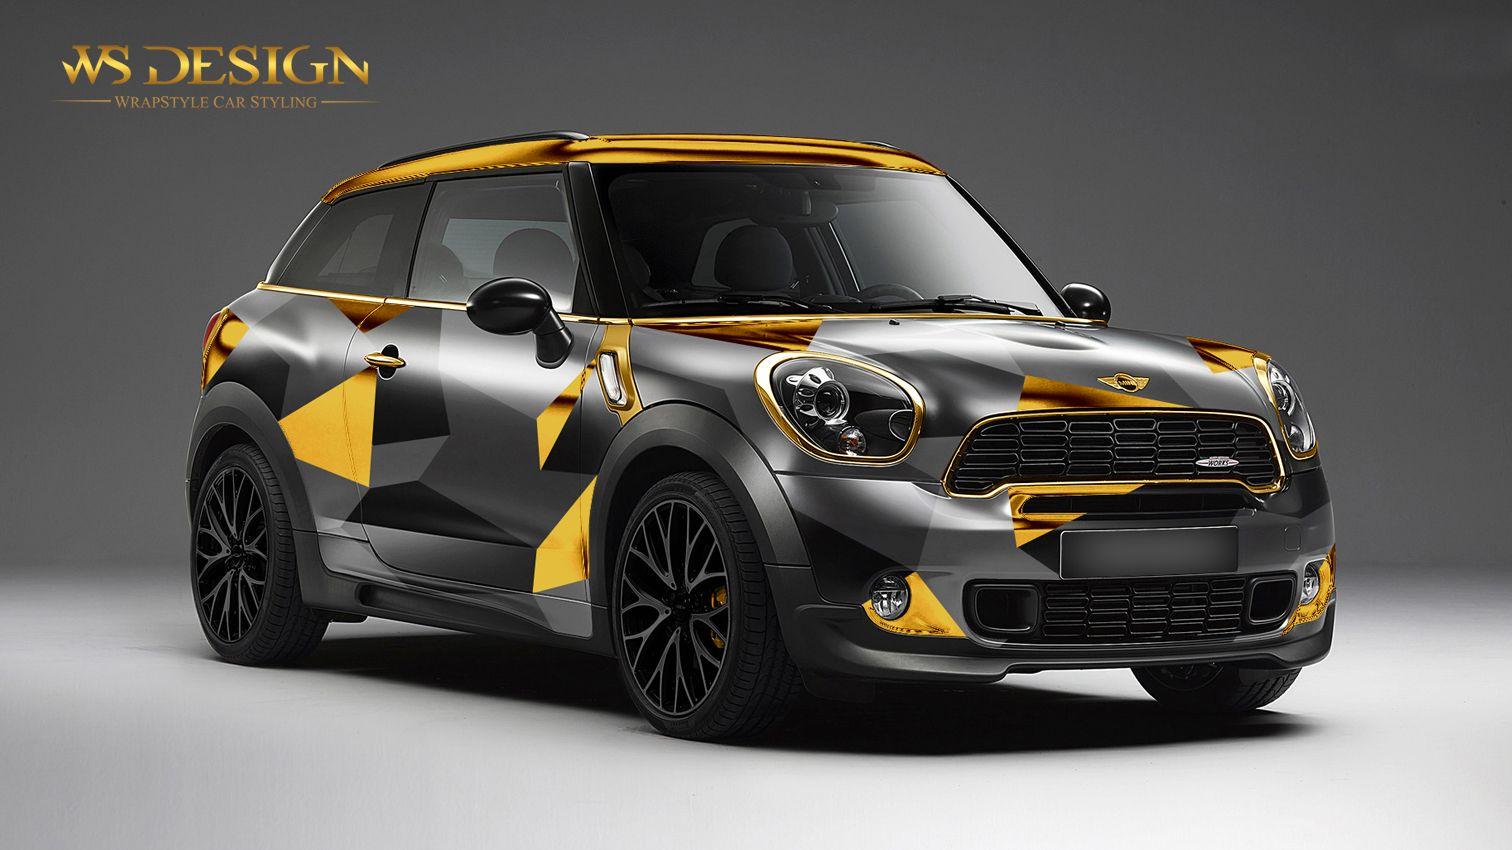 Superieur Auto Mini, Mini Countryman, Car Wrap, Vehicle Wraps, Design Cars,